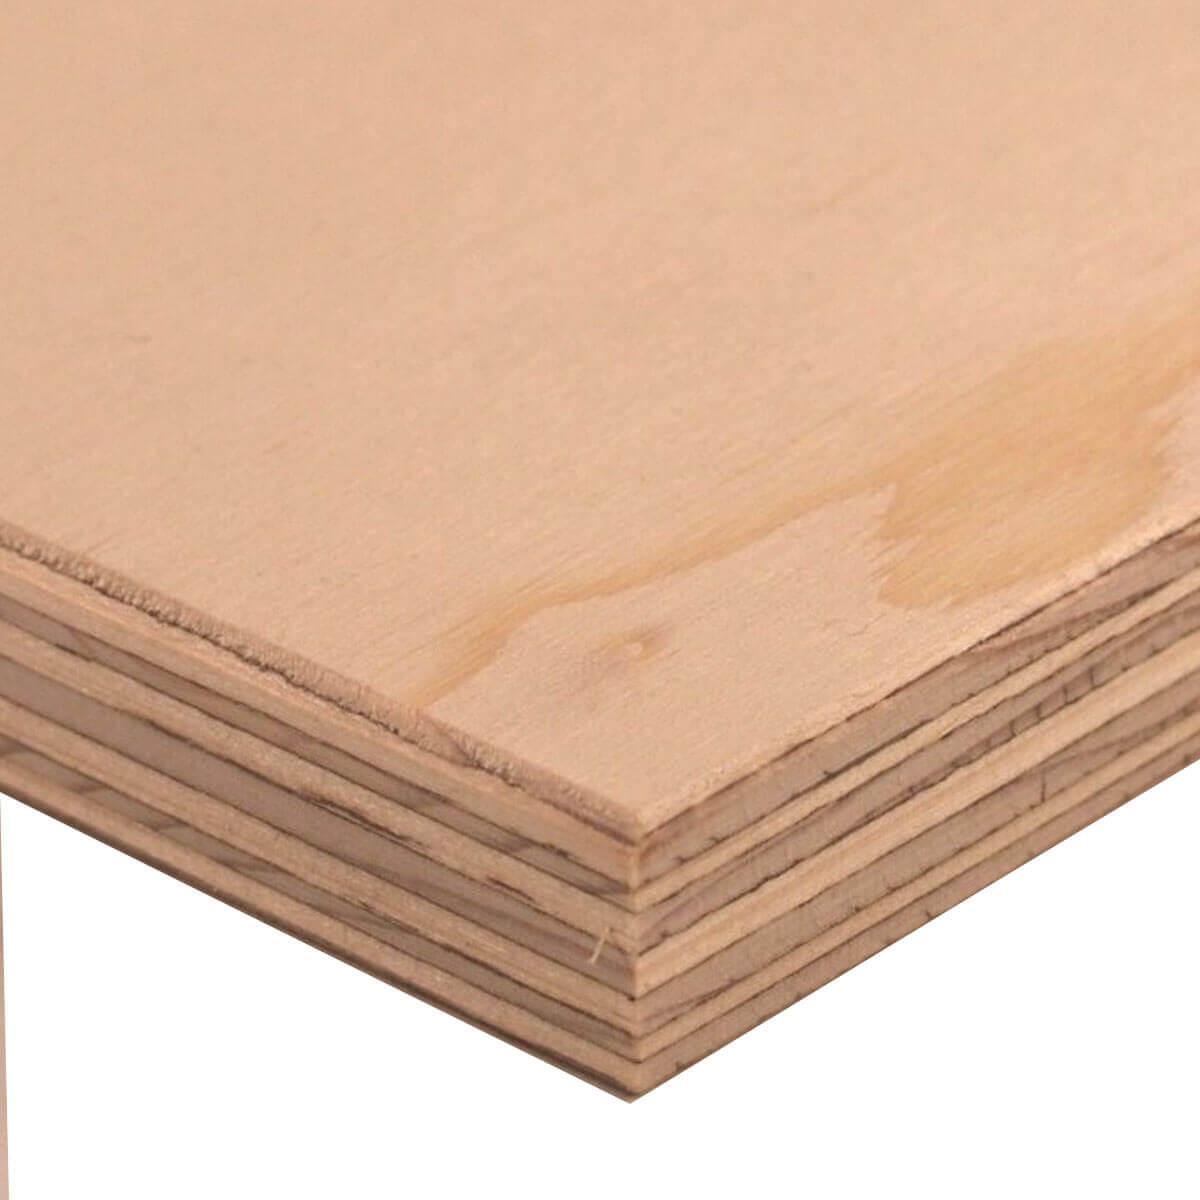 Standard Fir Plywood - 4 x 8 - 9.5 mm - 3/8-in